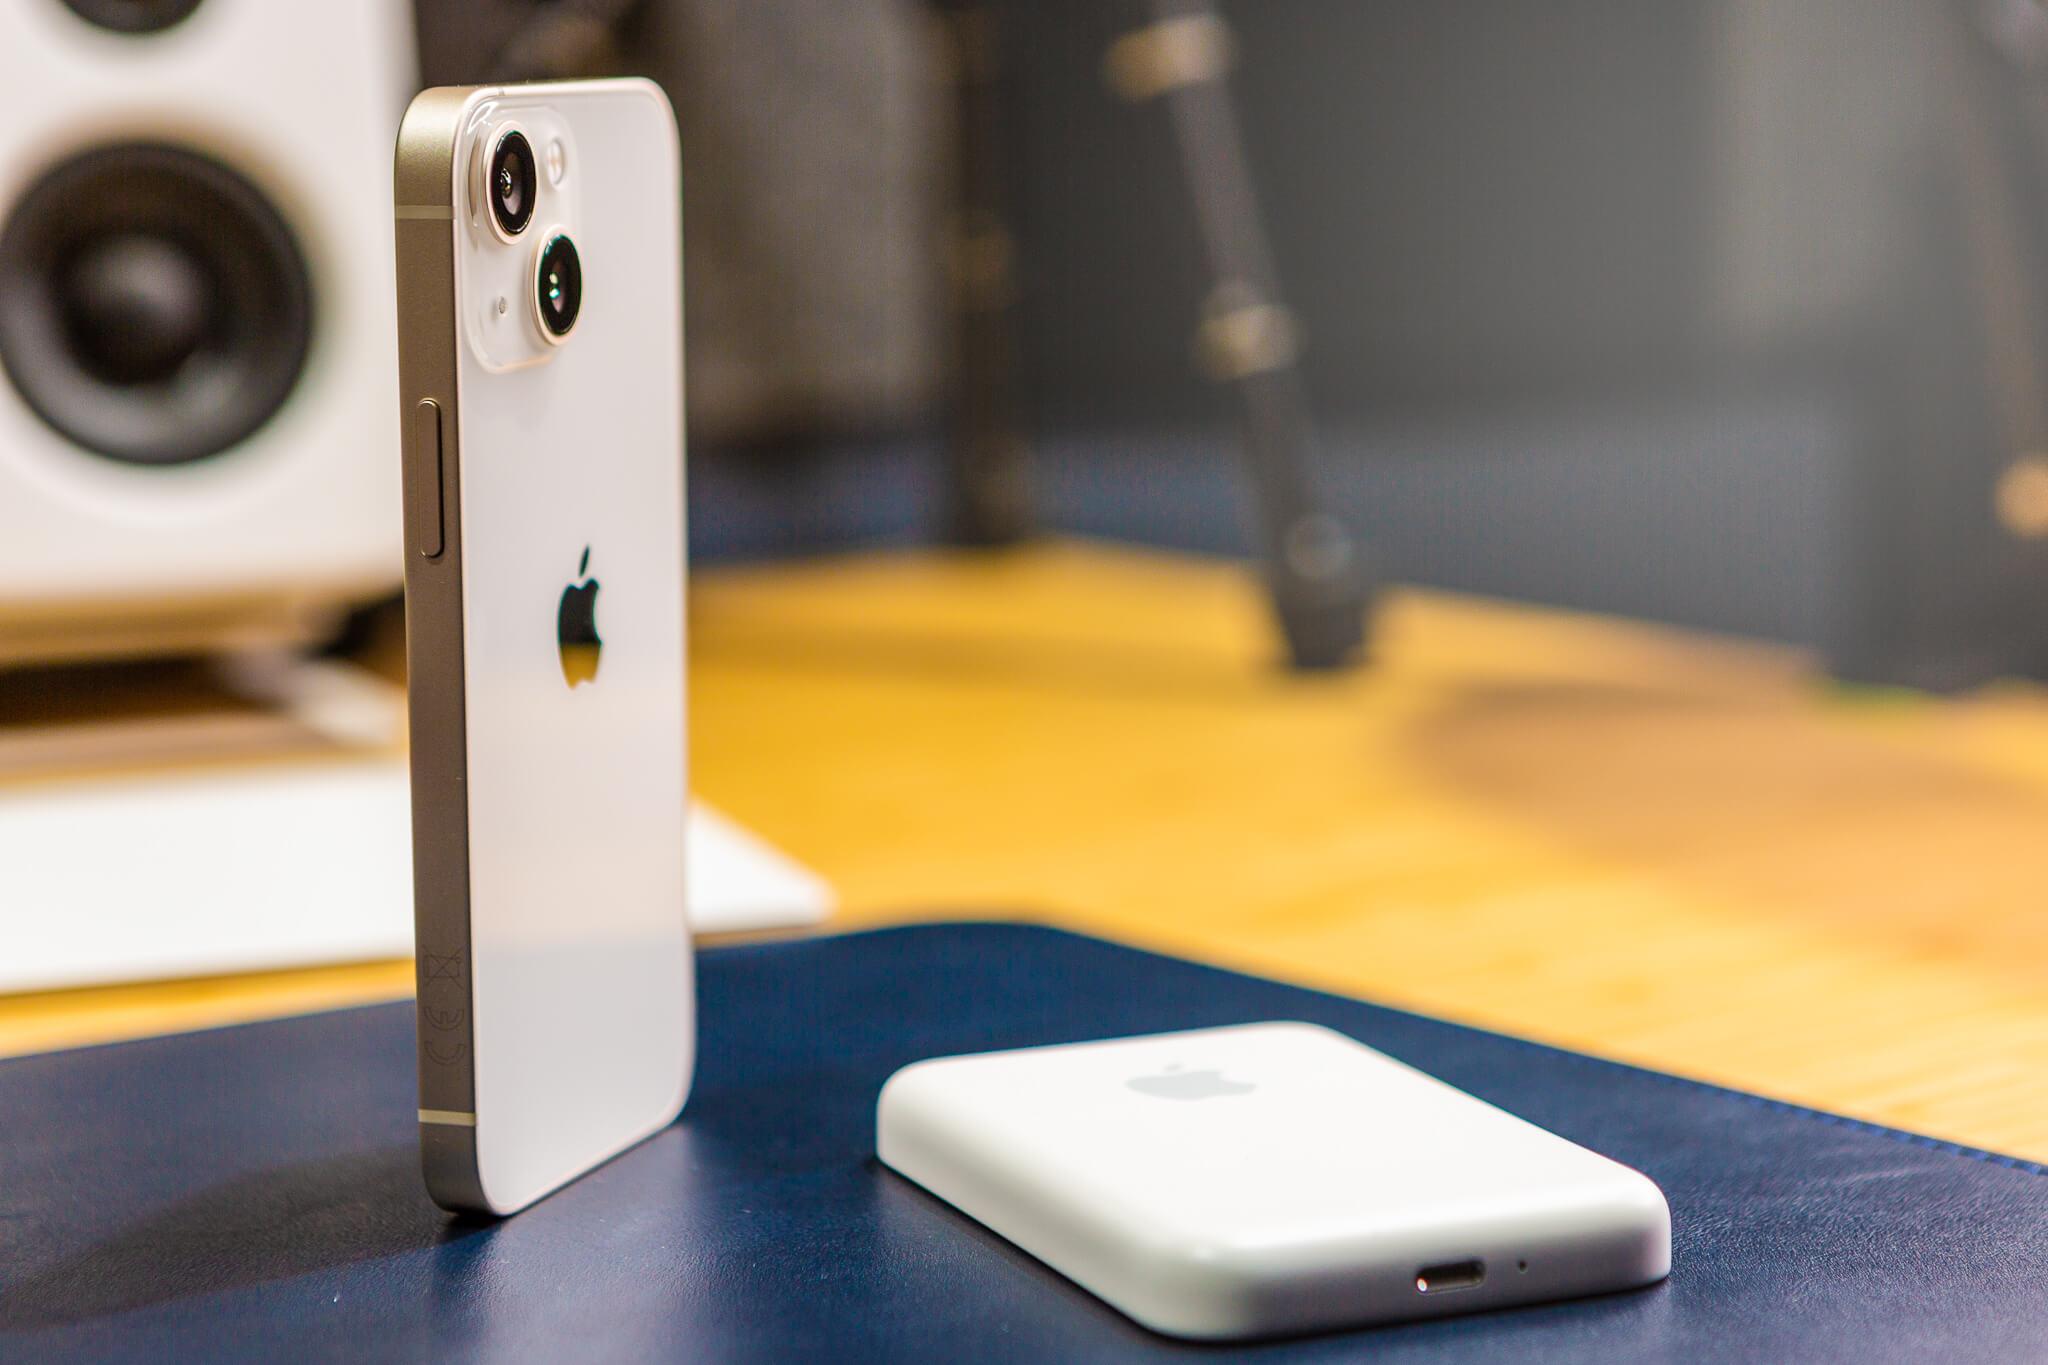 iPhone 13 mini battery